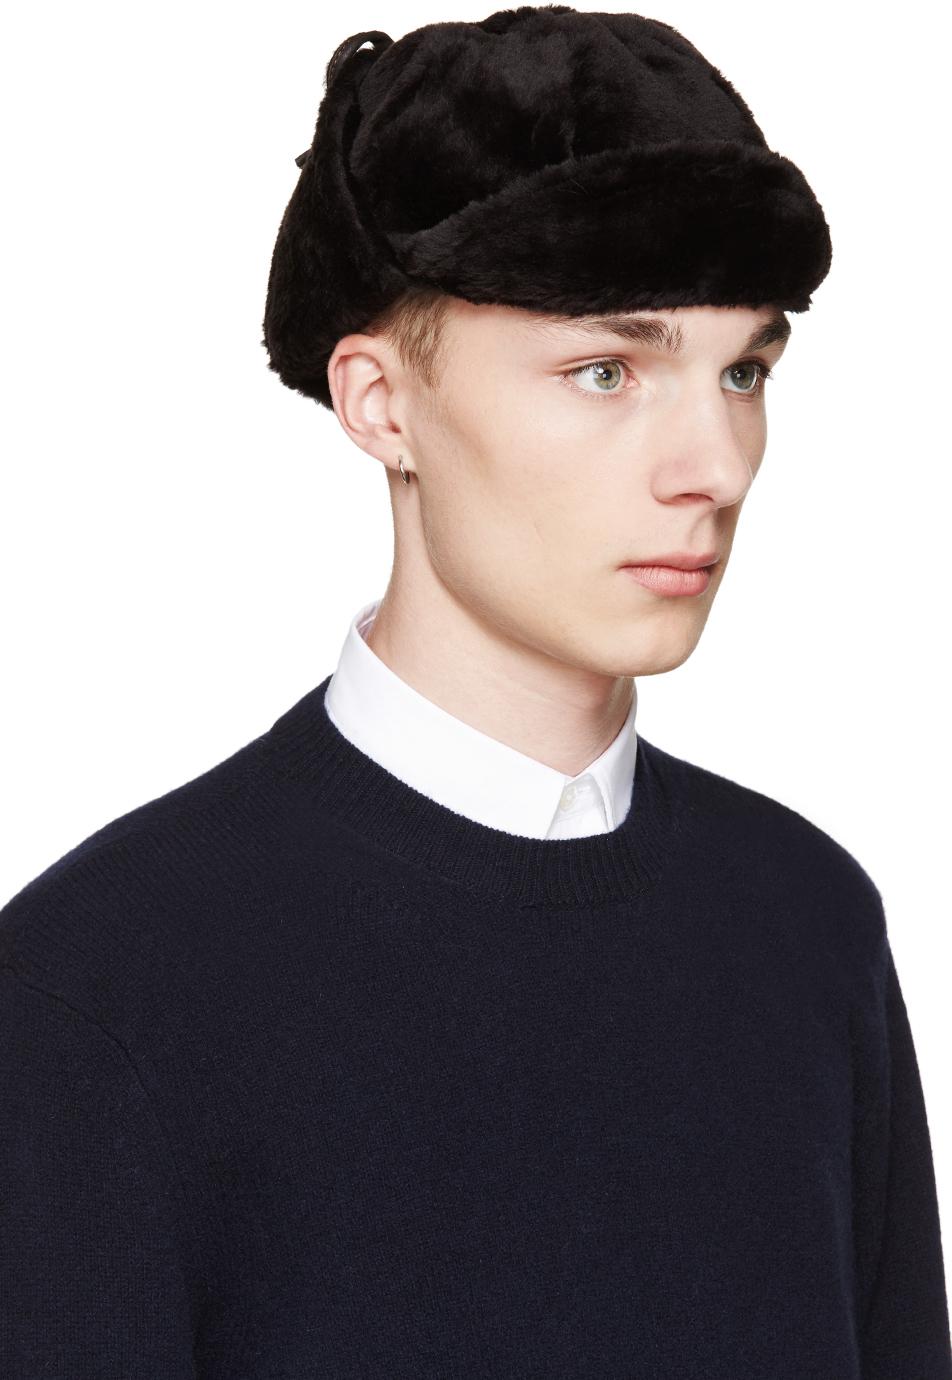 7f6e5dafc92 Paul Smith Black Sheepskin Trapper Hat in Black for Men - Lyst